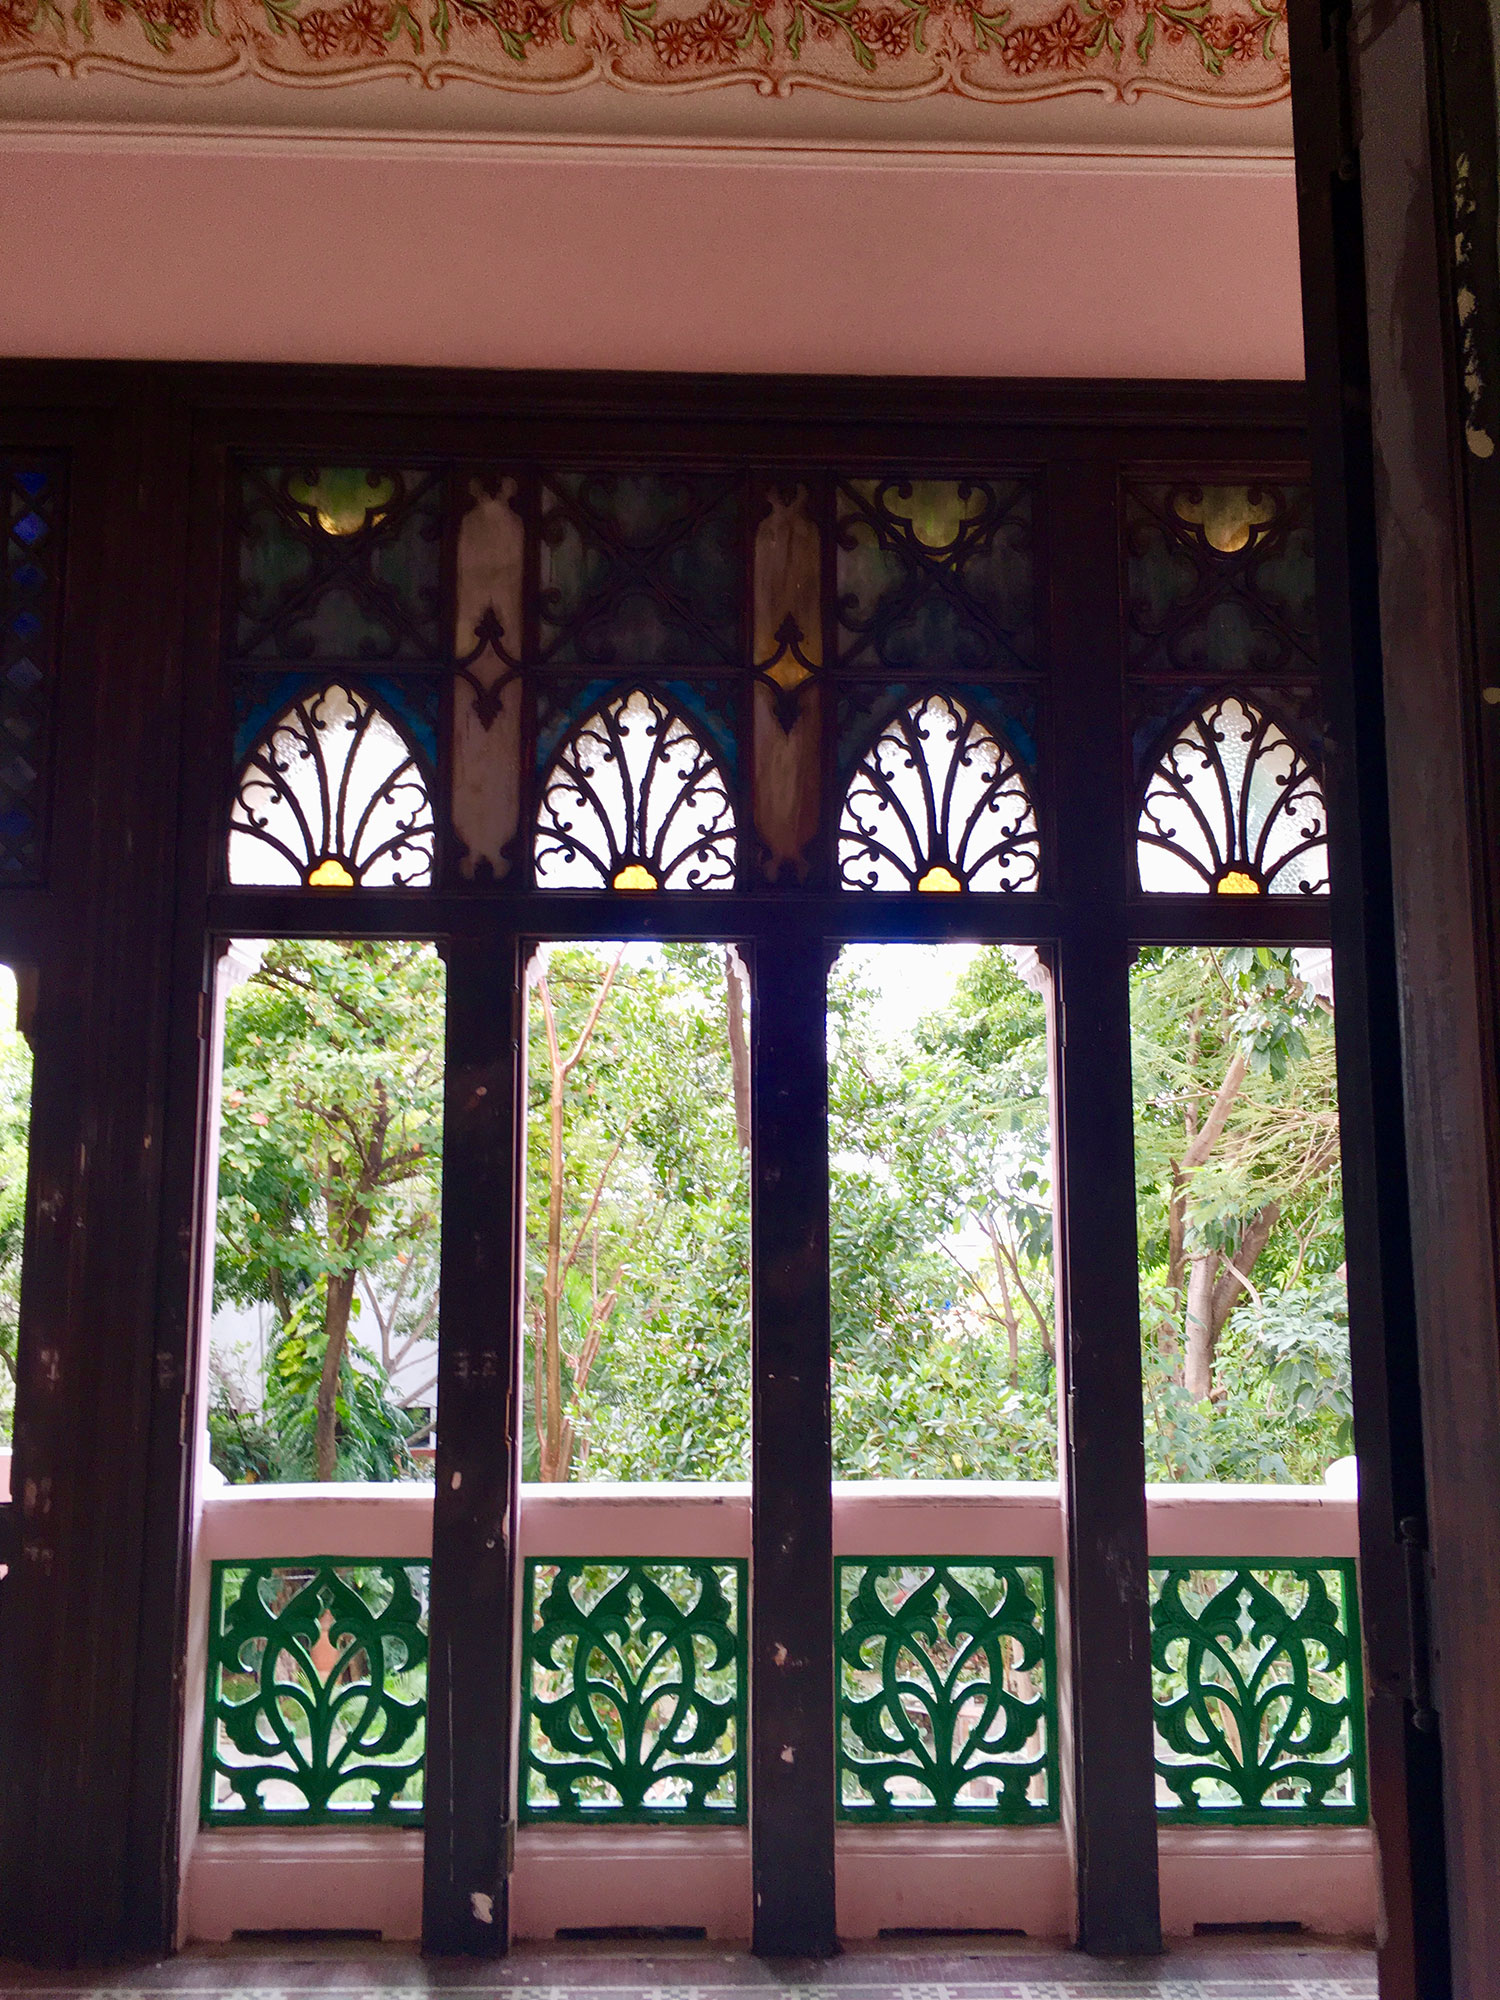 A green view from the Moorish window.